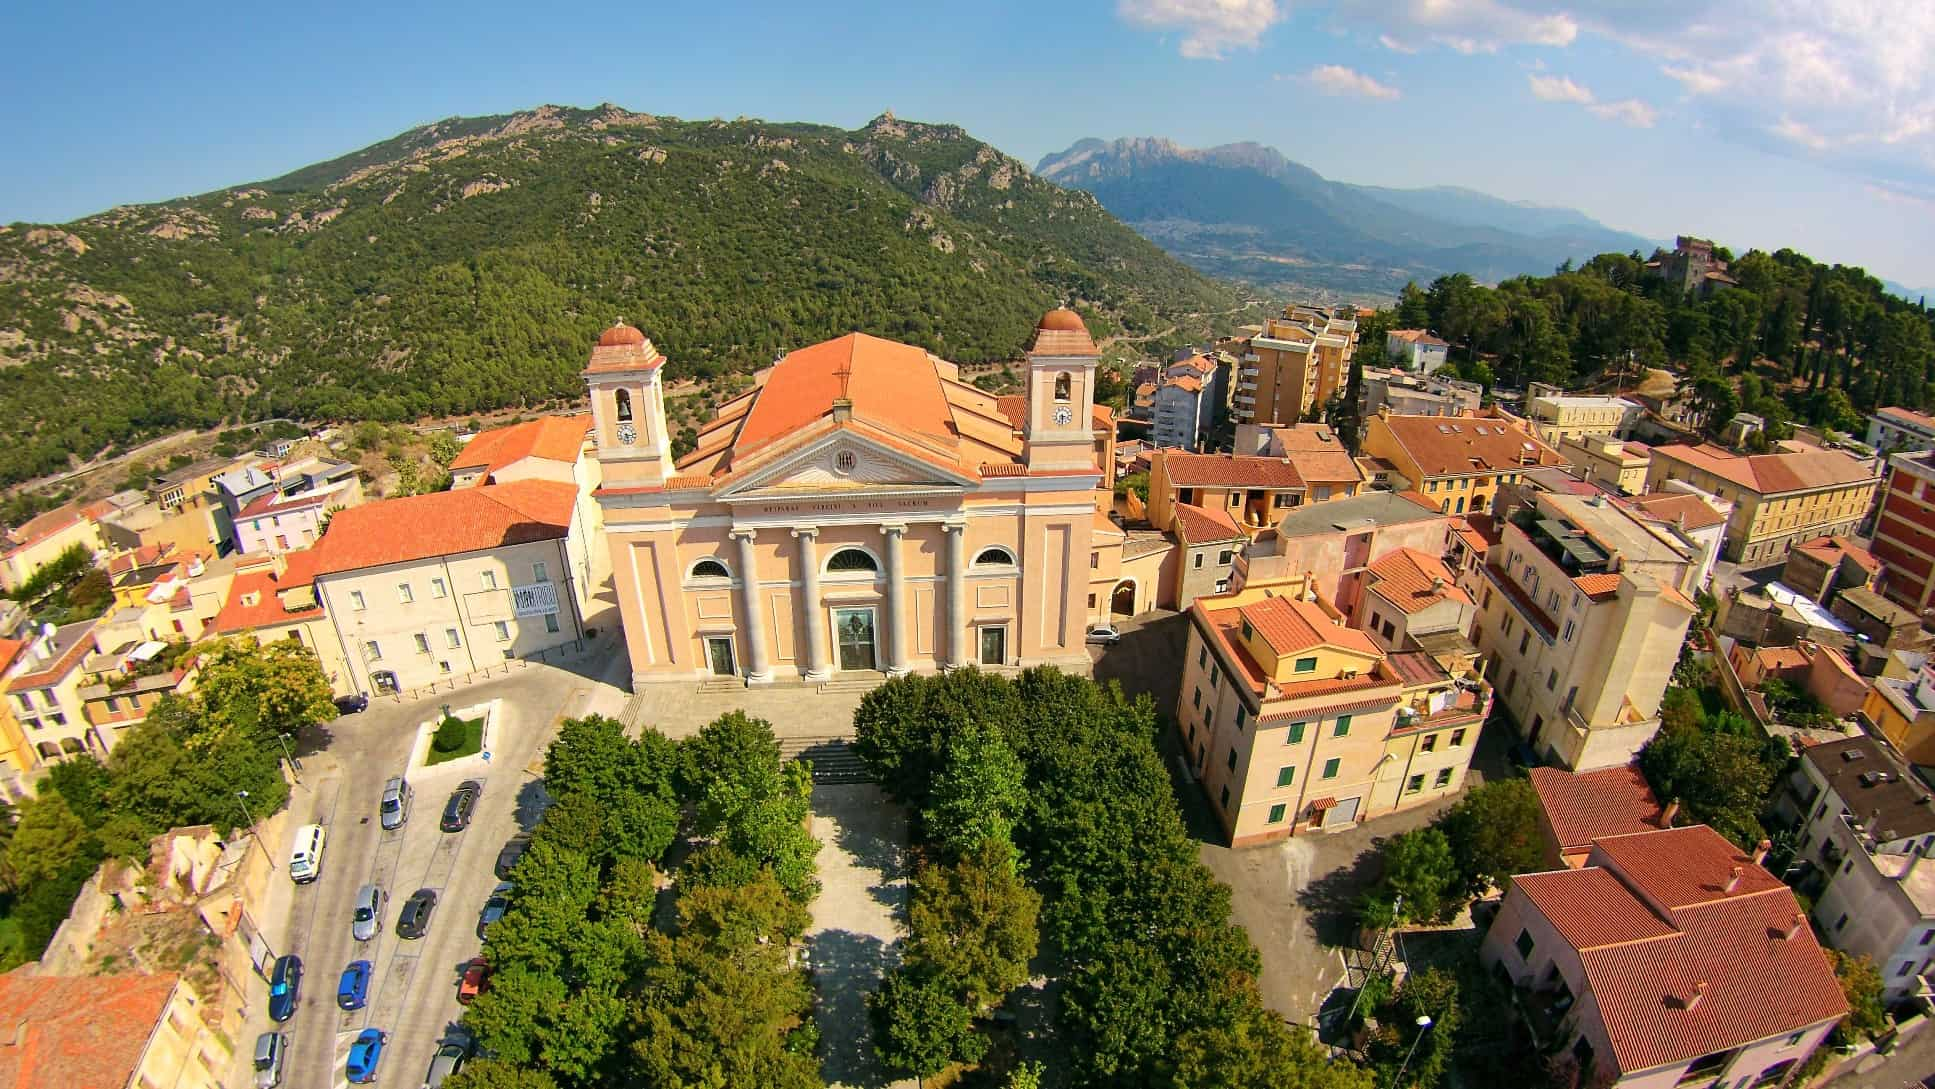 Nuoro Di Santa Maria Cathedral